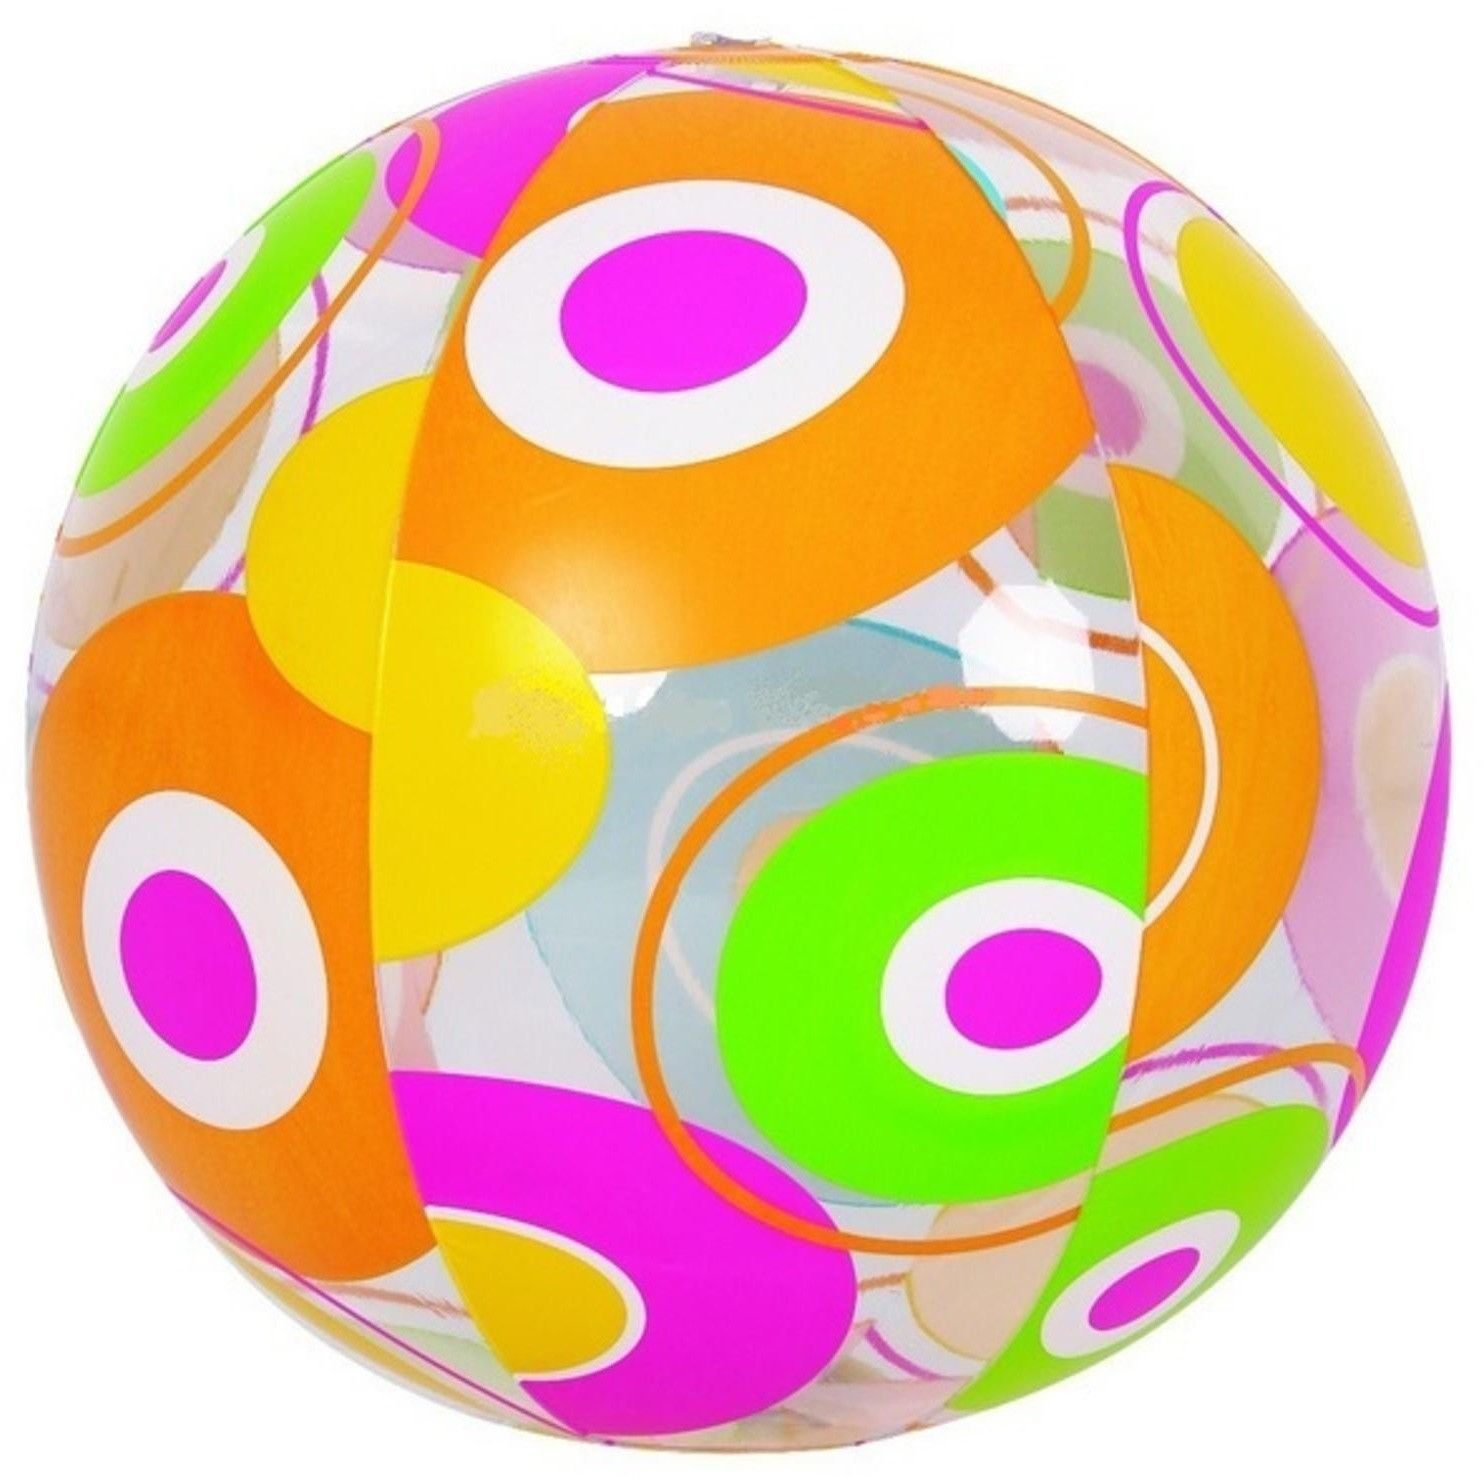 Jilong colorful panel circle. Beachball clipart pool toy